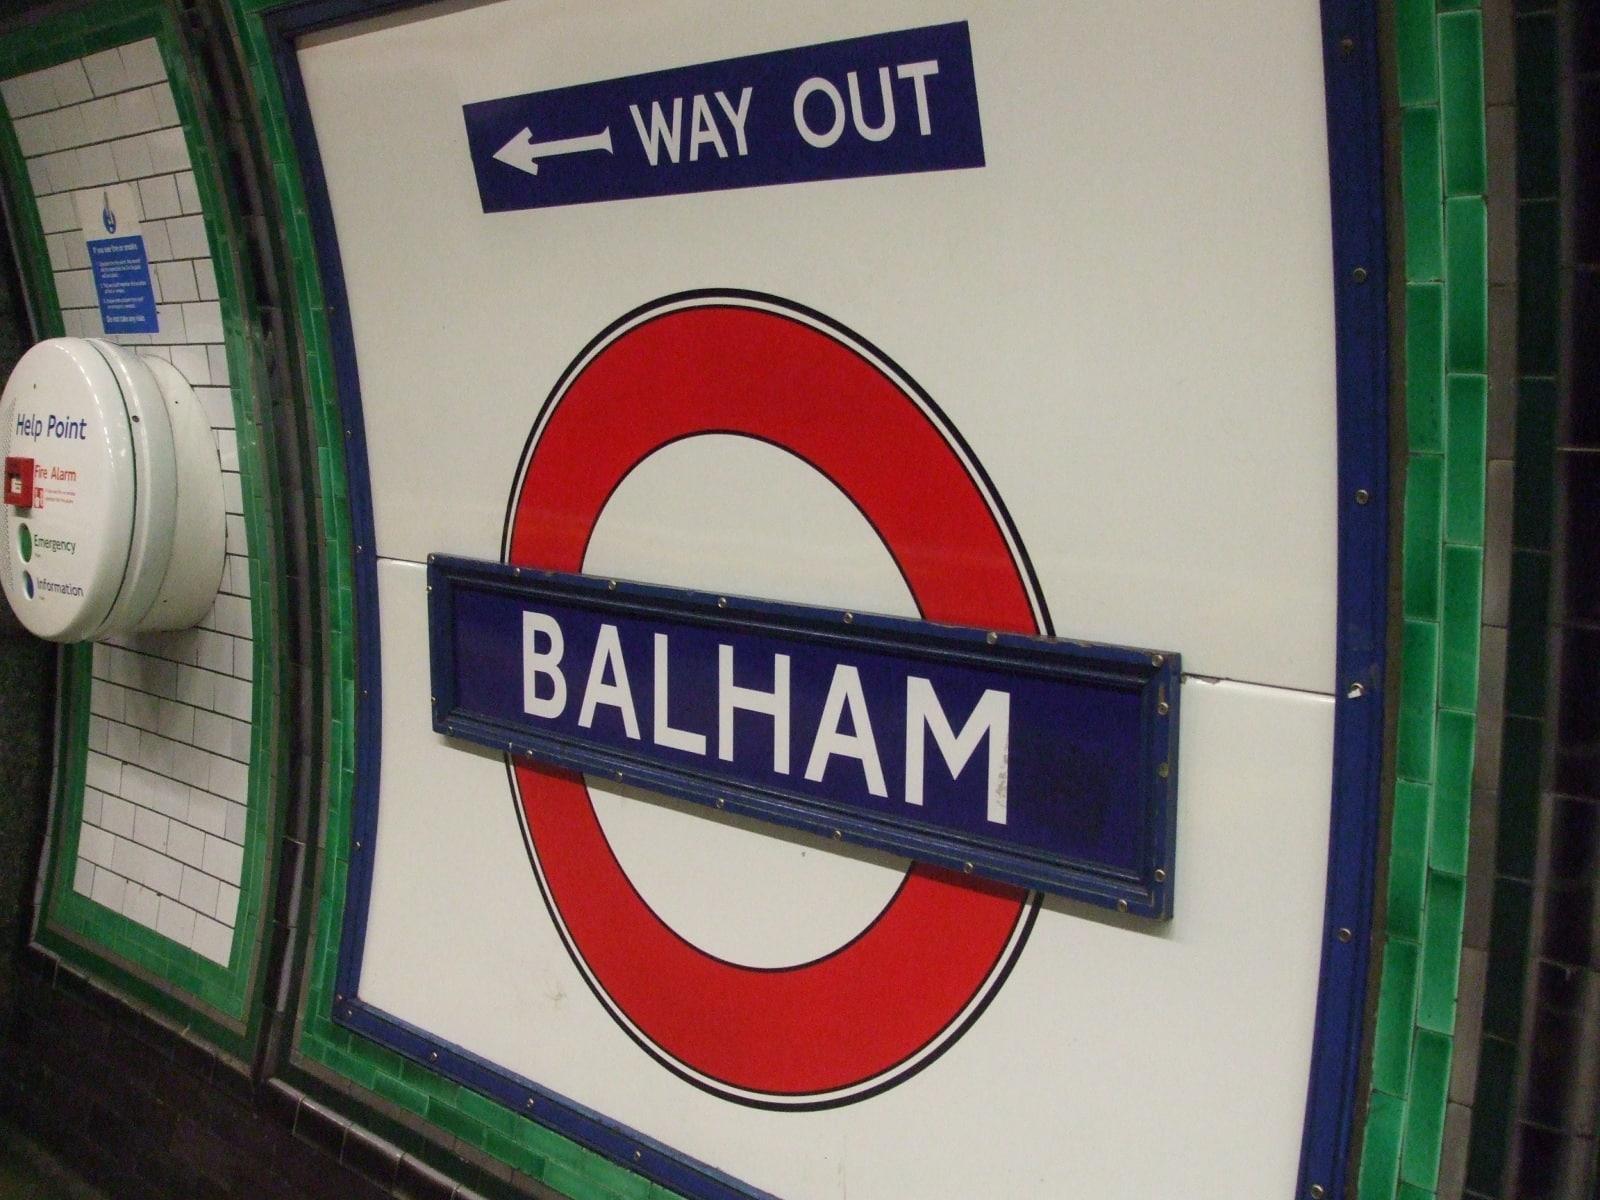 Sanding wood floors and worktops in Balham